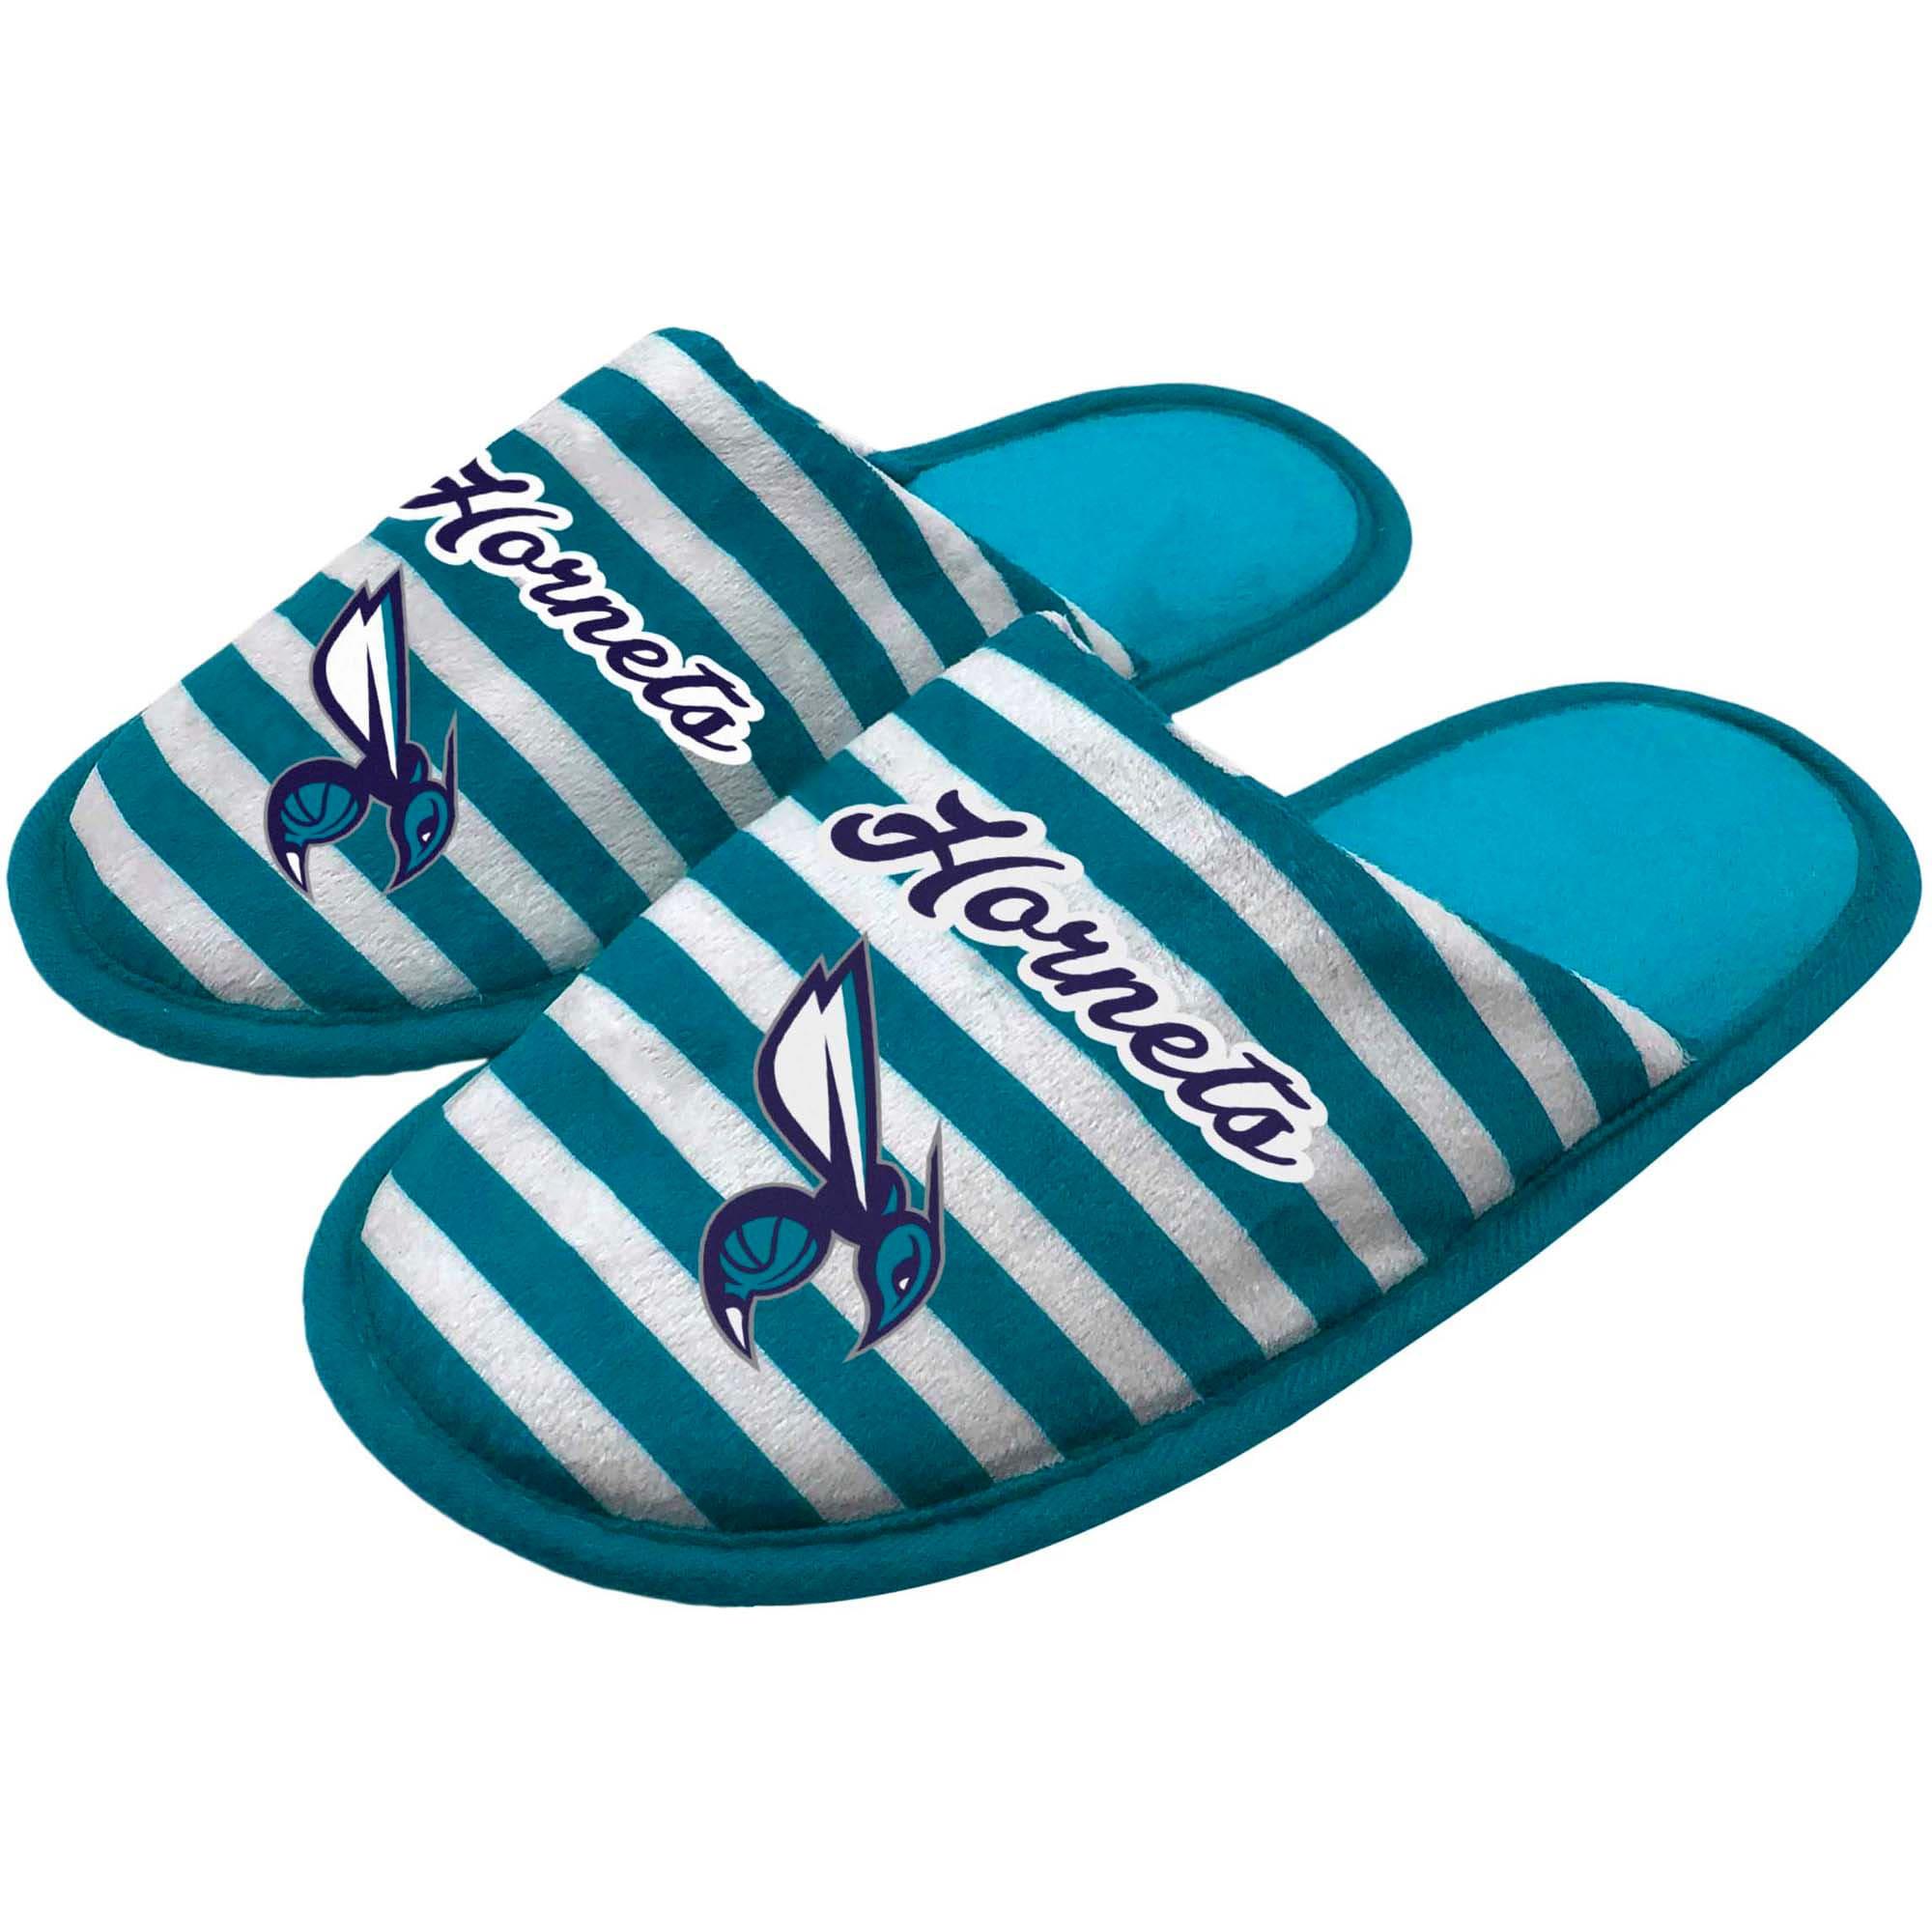 Charlotte Hornets Women's Scuff Slippers